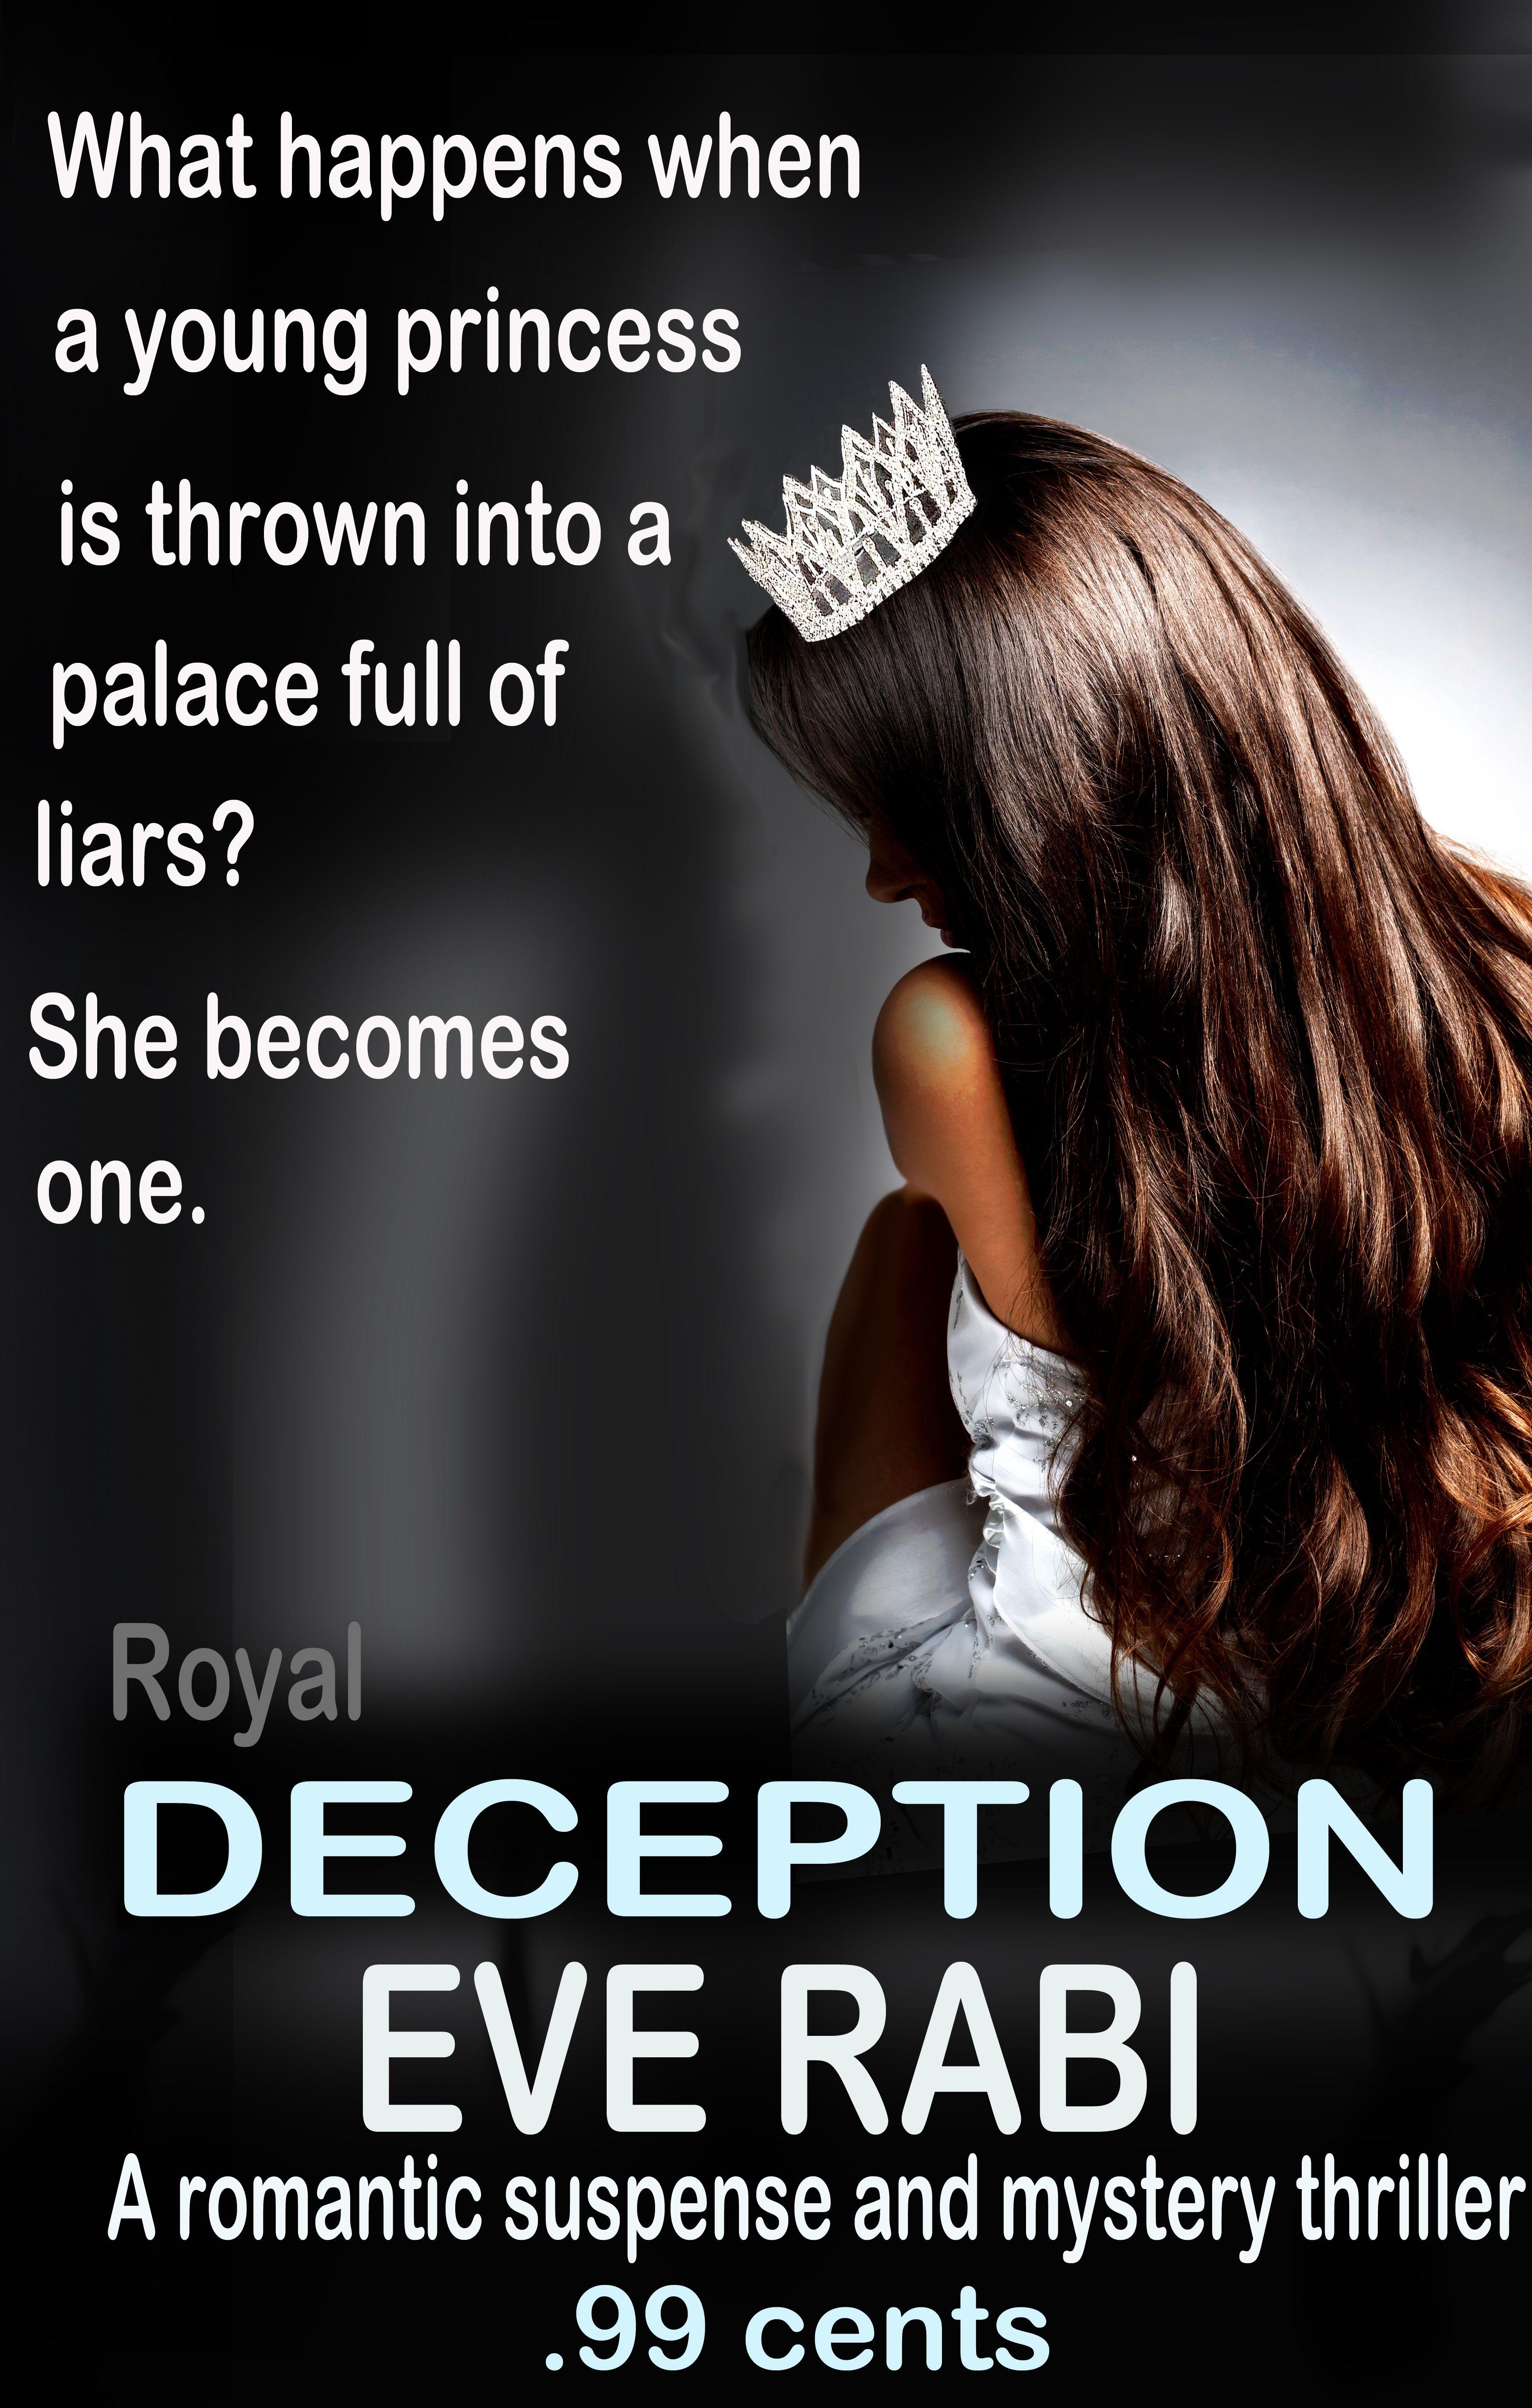 "#RomanticSuspense #RomanticCrime #EveRabi #Deception #Books # Reading ...""So good, I'm still thinking about this story a week after  reading it."" Amazon reviewer #EveRabi  #RomanceNovels #LoveTriangles #FictionForWoman #ModernRomance Amazon UK: http://amzn.to/1DCmn2w Amazon US: http://amzn.to/1sHcMnY Amazon Aus: http://bit.ly/1DVnBZk Amazon US: http://amzn.com/B00BC1H04K Amazon UK: http://www.amazon.co.uk/dp/B00BC1H04K Amazon Aus: http://www.amazon.com.au/dp/B00BC1H04K"